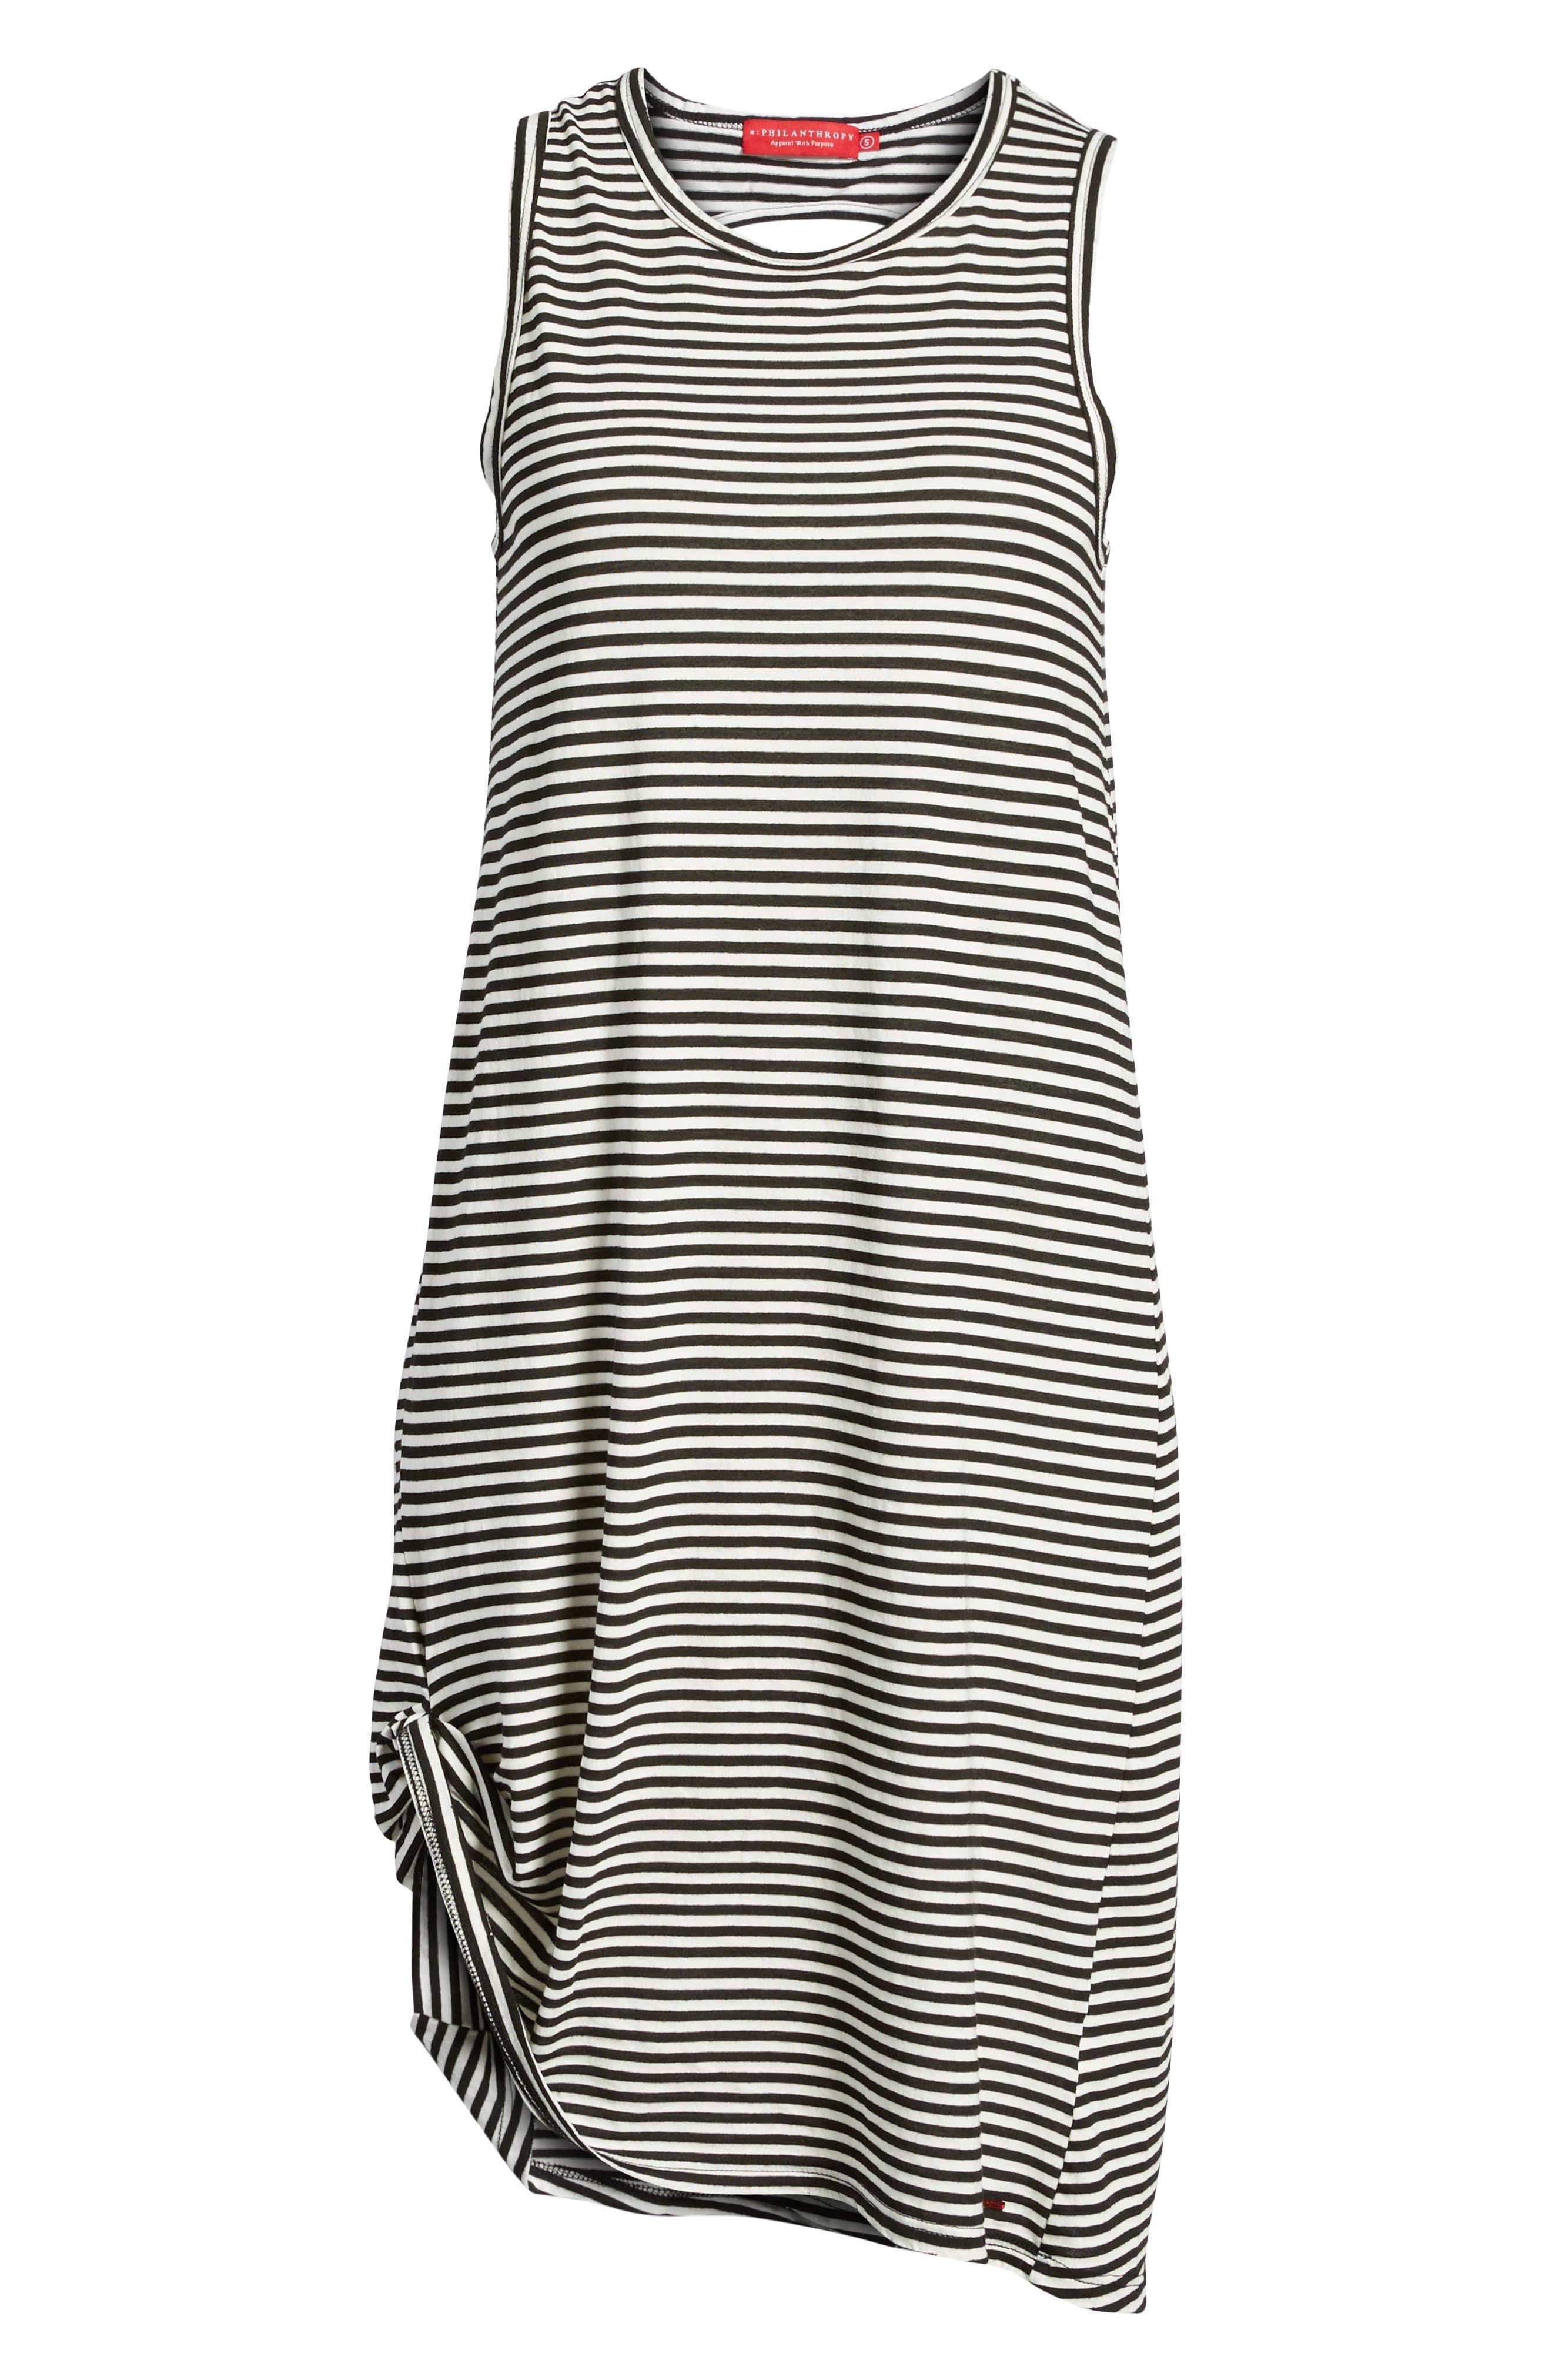 Boo Stripe High/Low Dress,                             Alternate thumbnail 7, color,                             Black Cat/ White Stripe